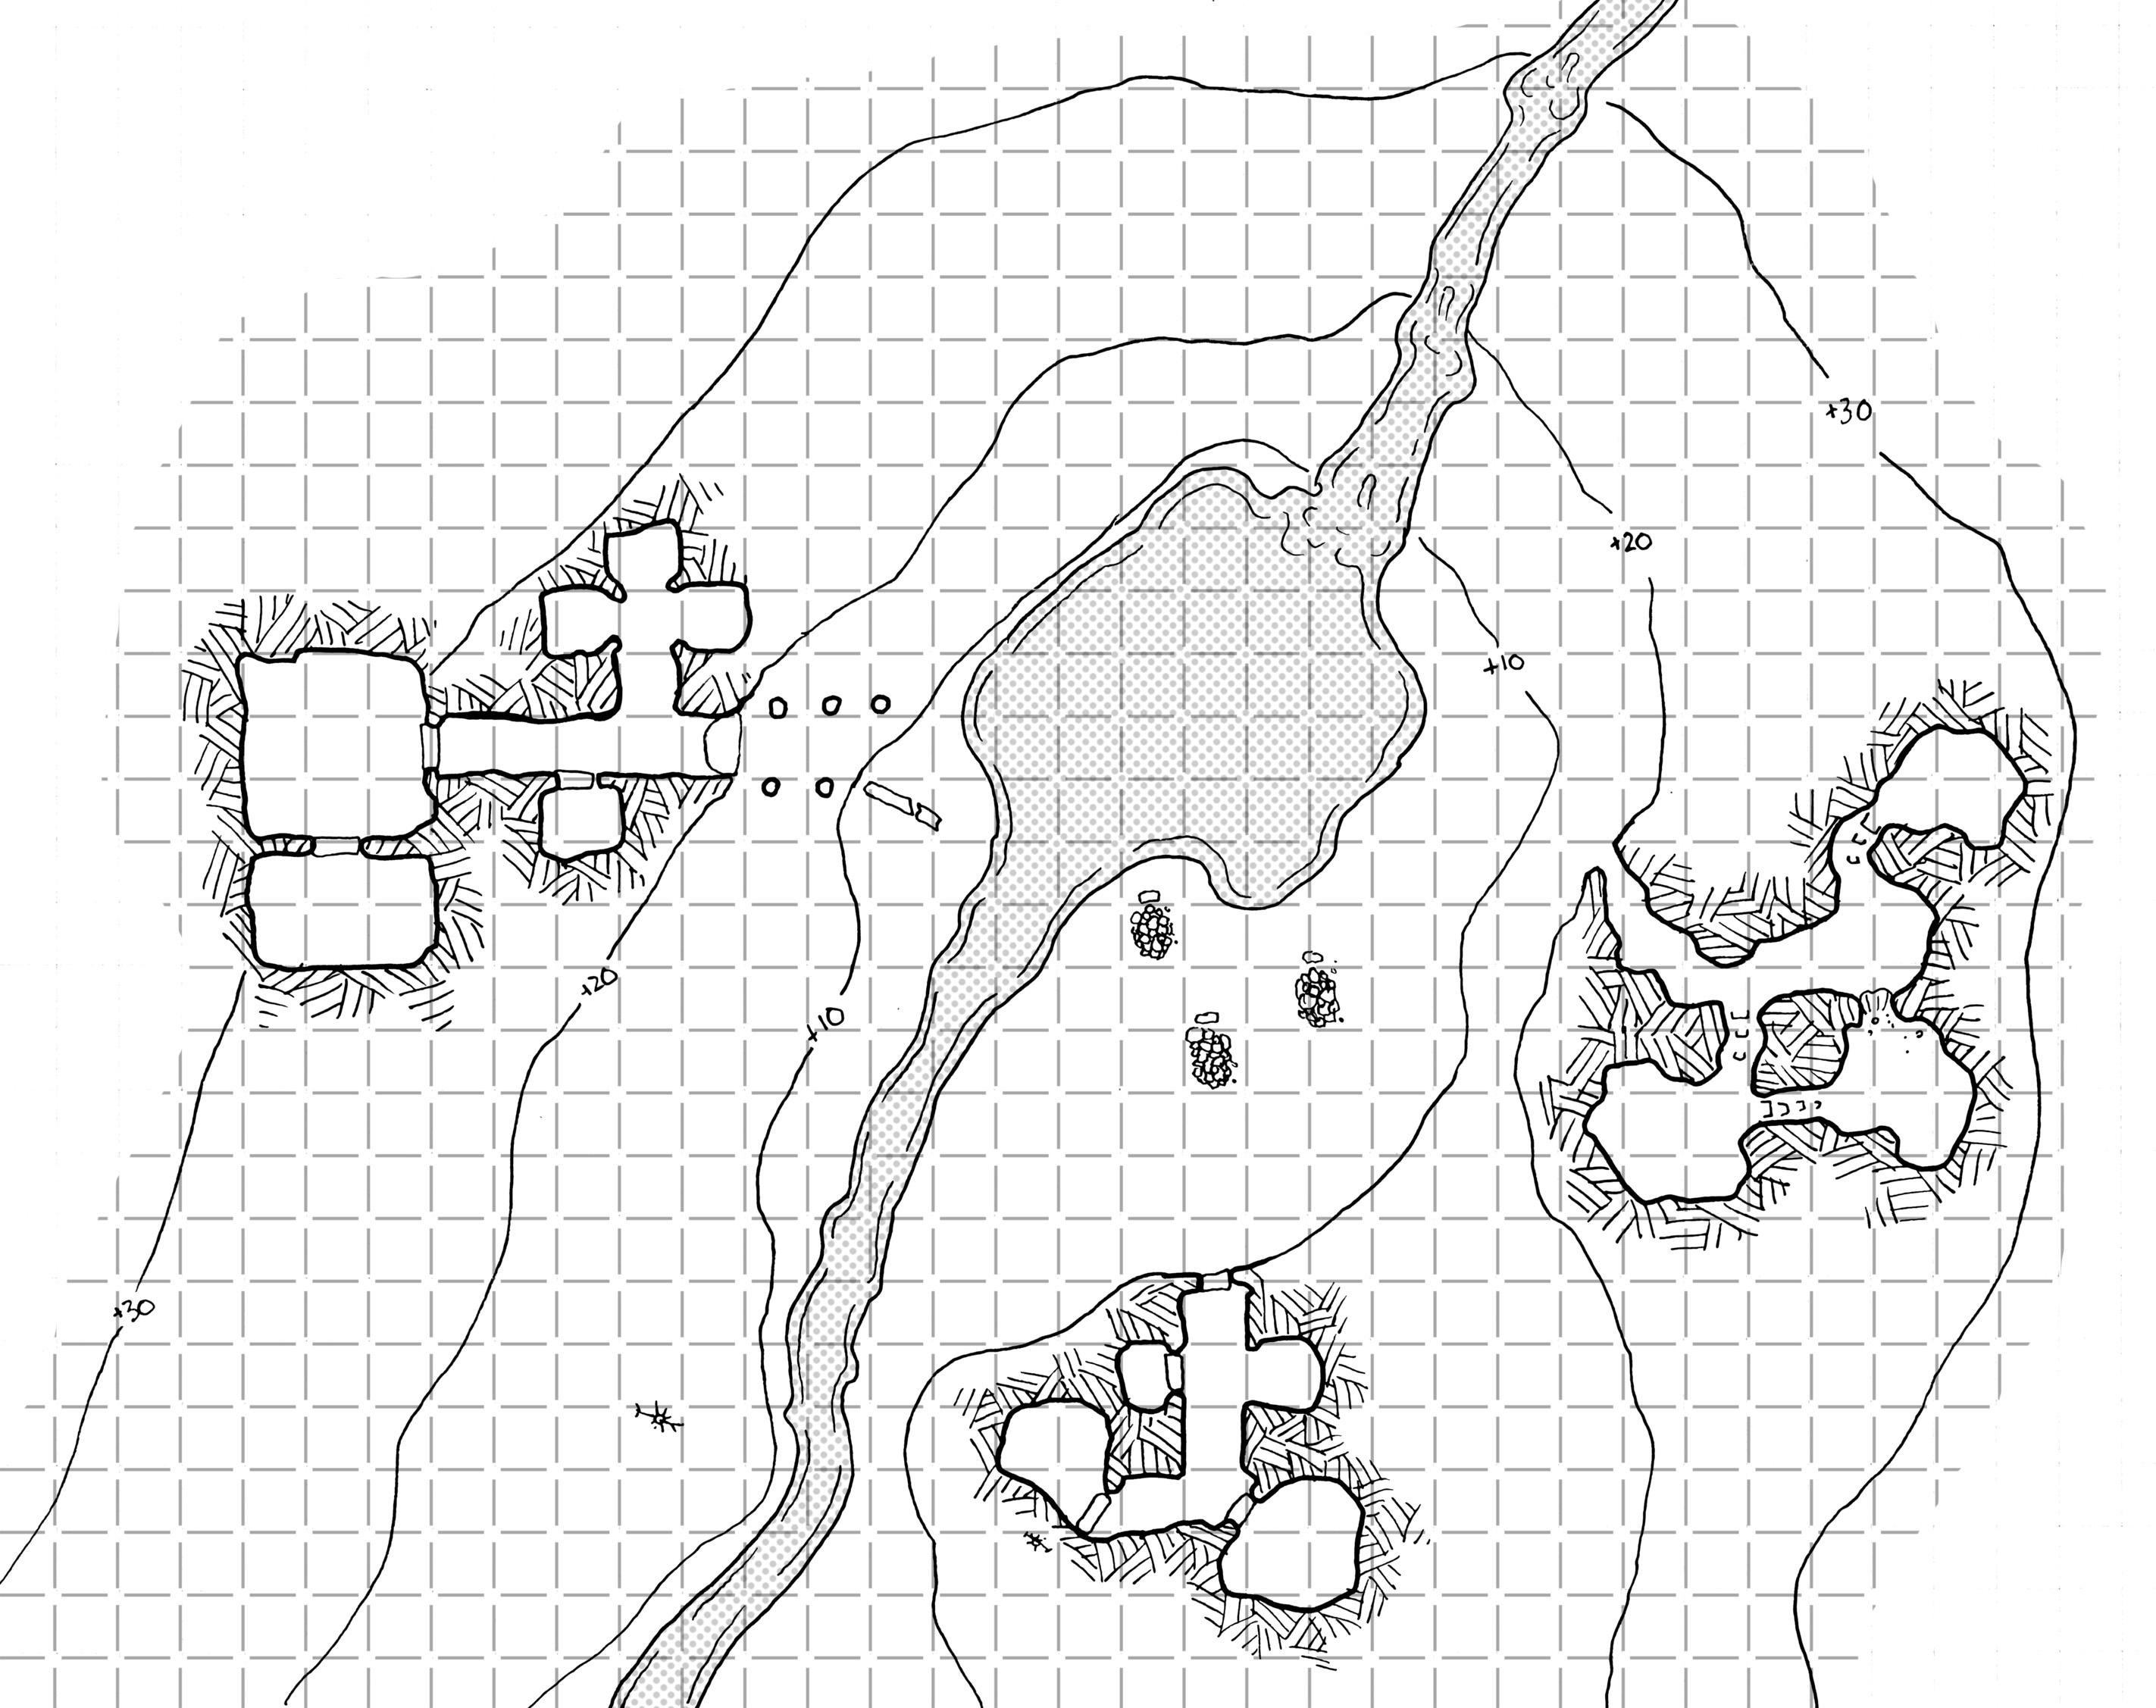 Lands Of The Drenai, From The Books By David Gemmell  David Gemmell   Pinterest  Fantasy Map